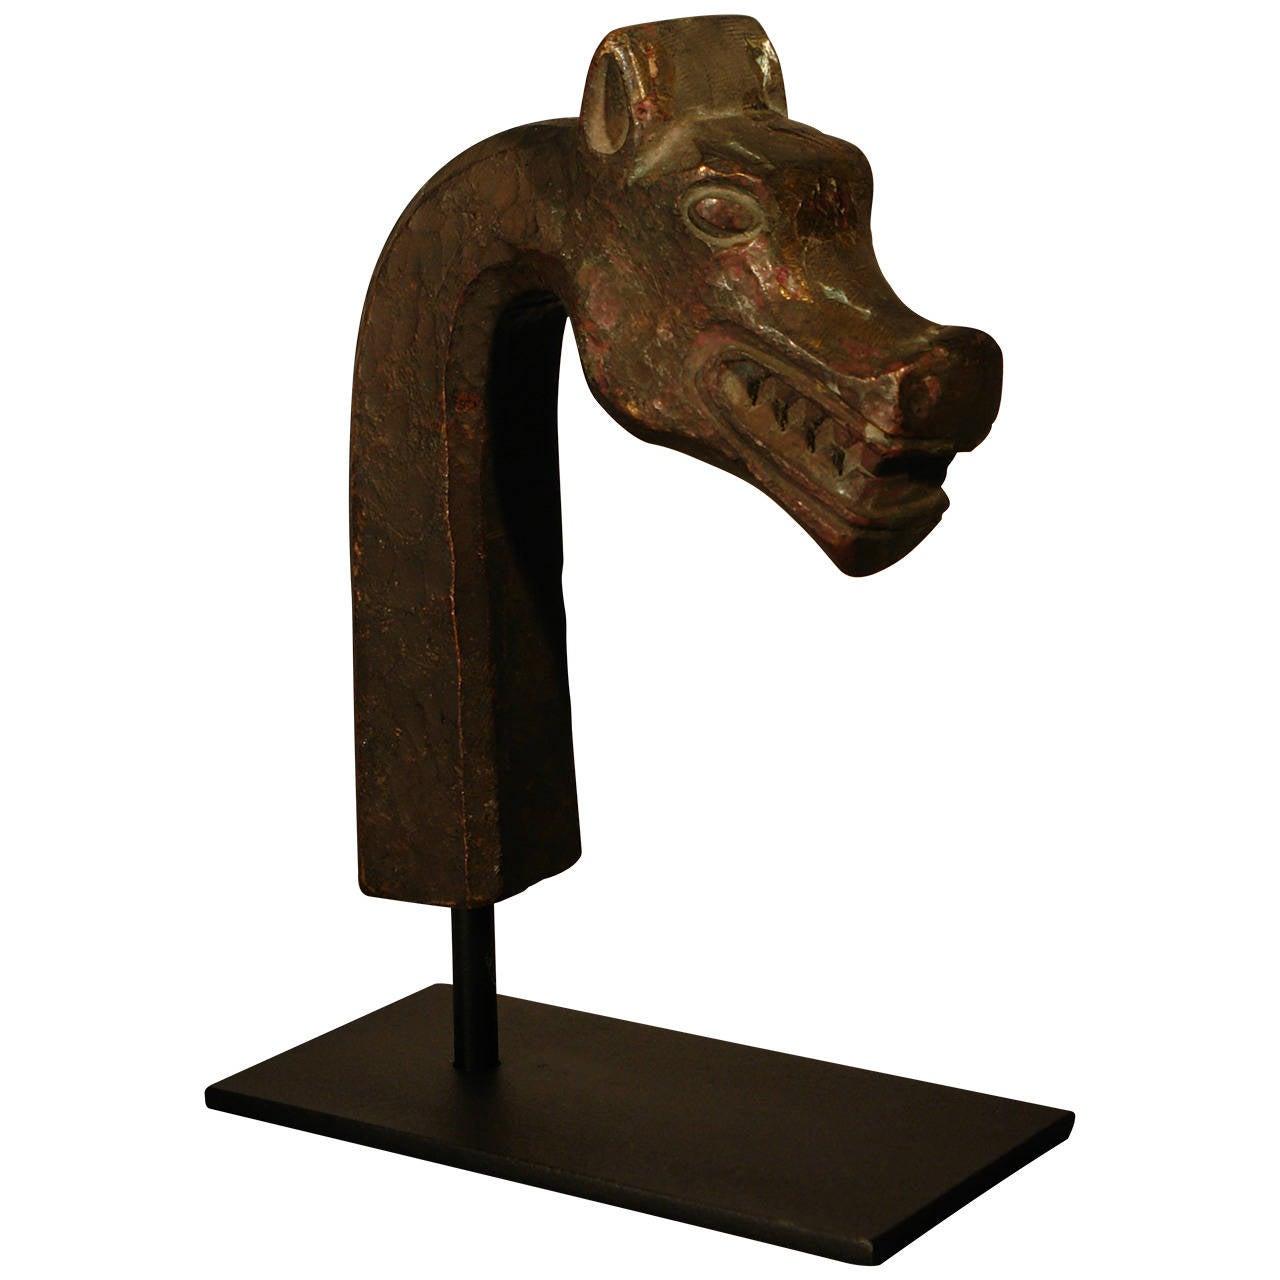 french art deco bronze mythological beast head sculpture circa 1930 at 1stdibs. Black Bedroom Furniture Sets. Home Design Ideas